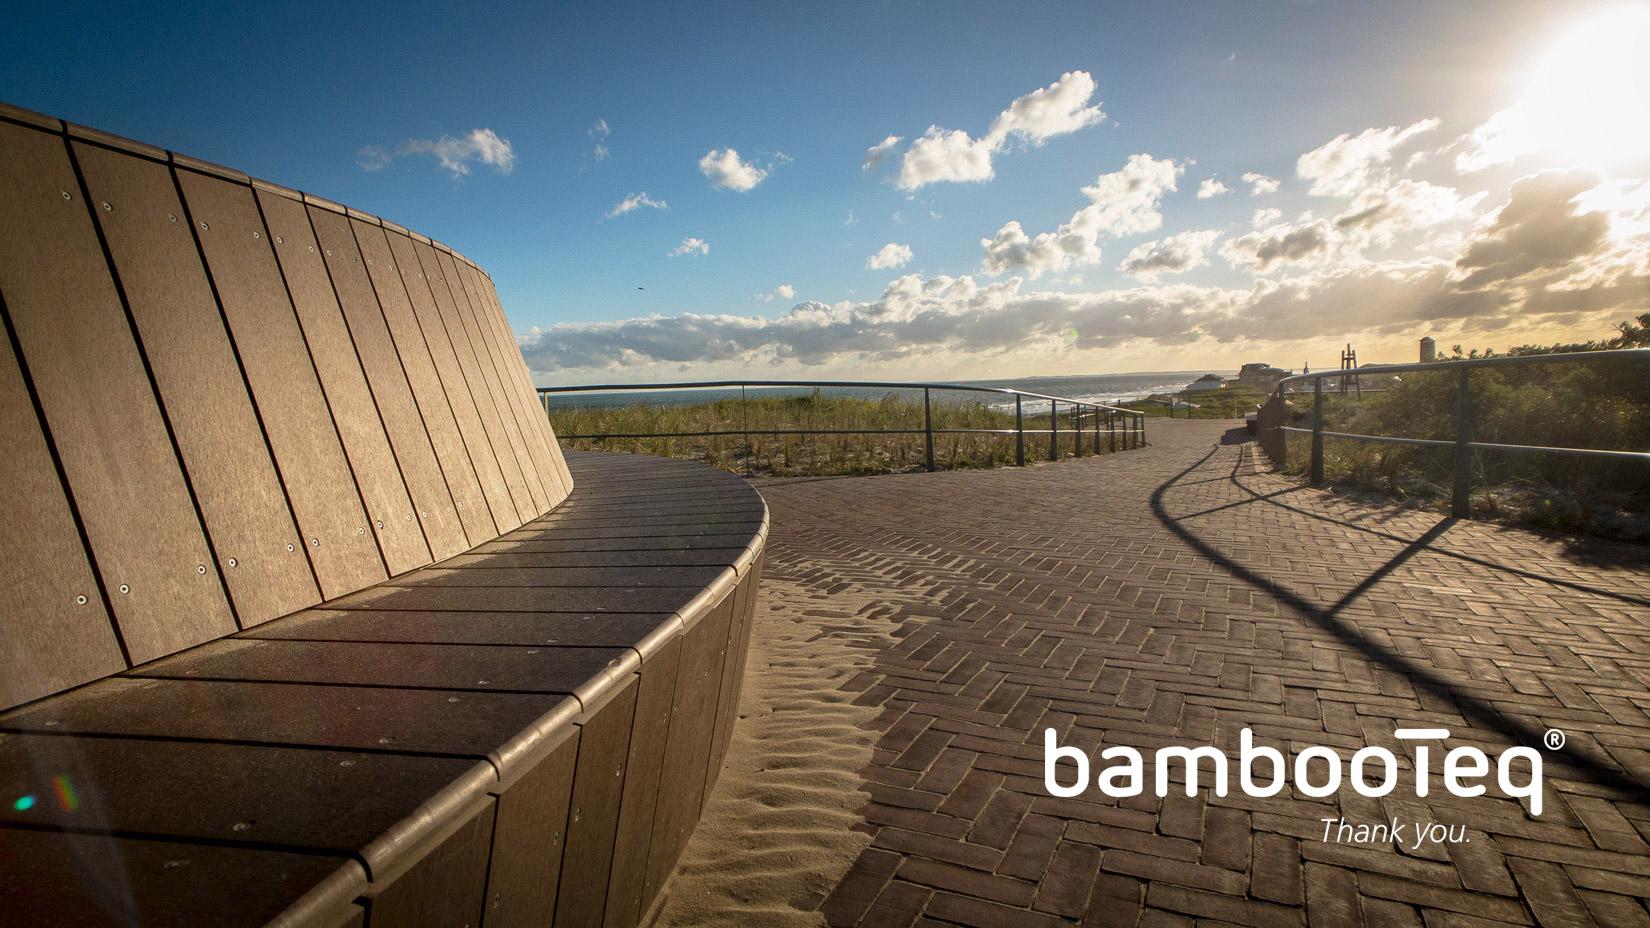 Bamboe van BambooTeq, duurzaam bouwen in Nederland